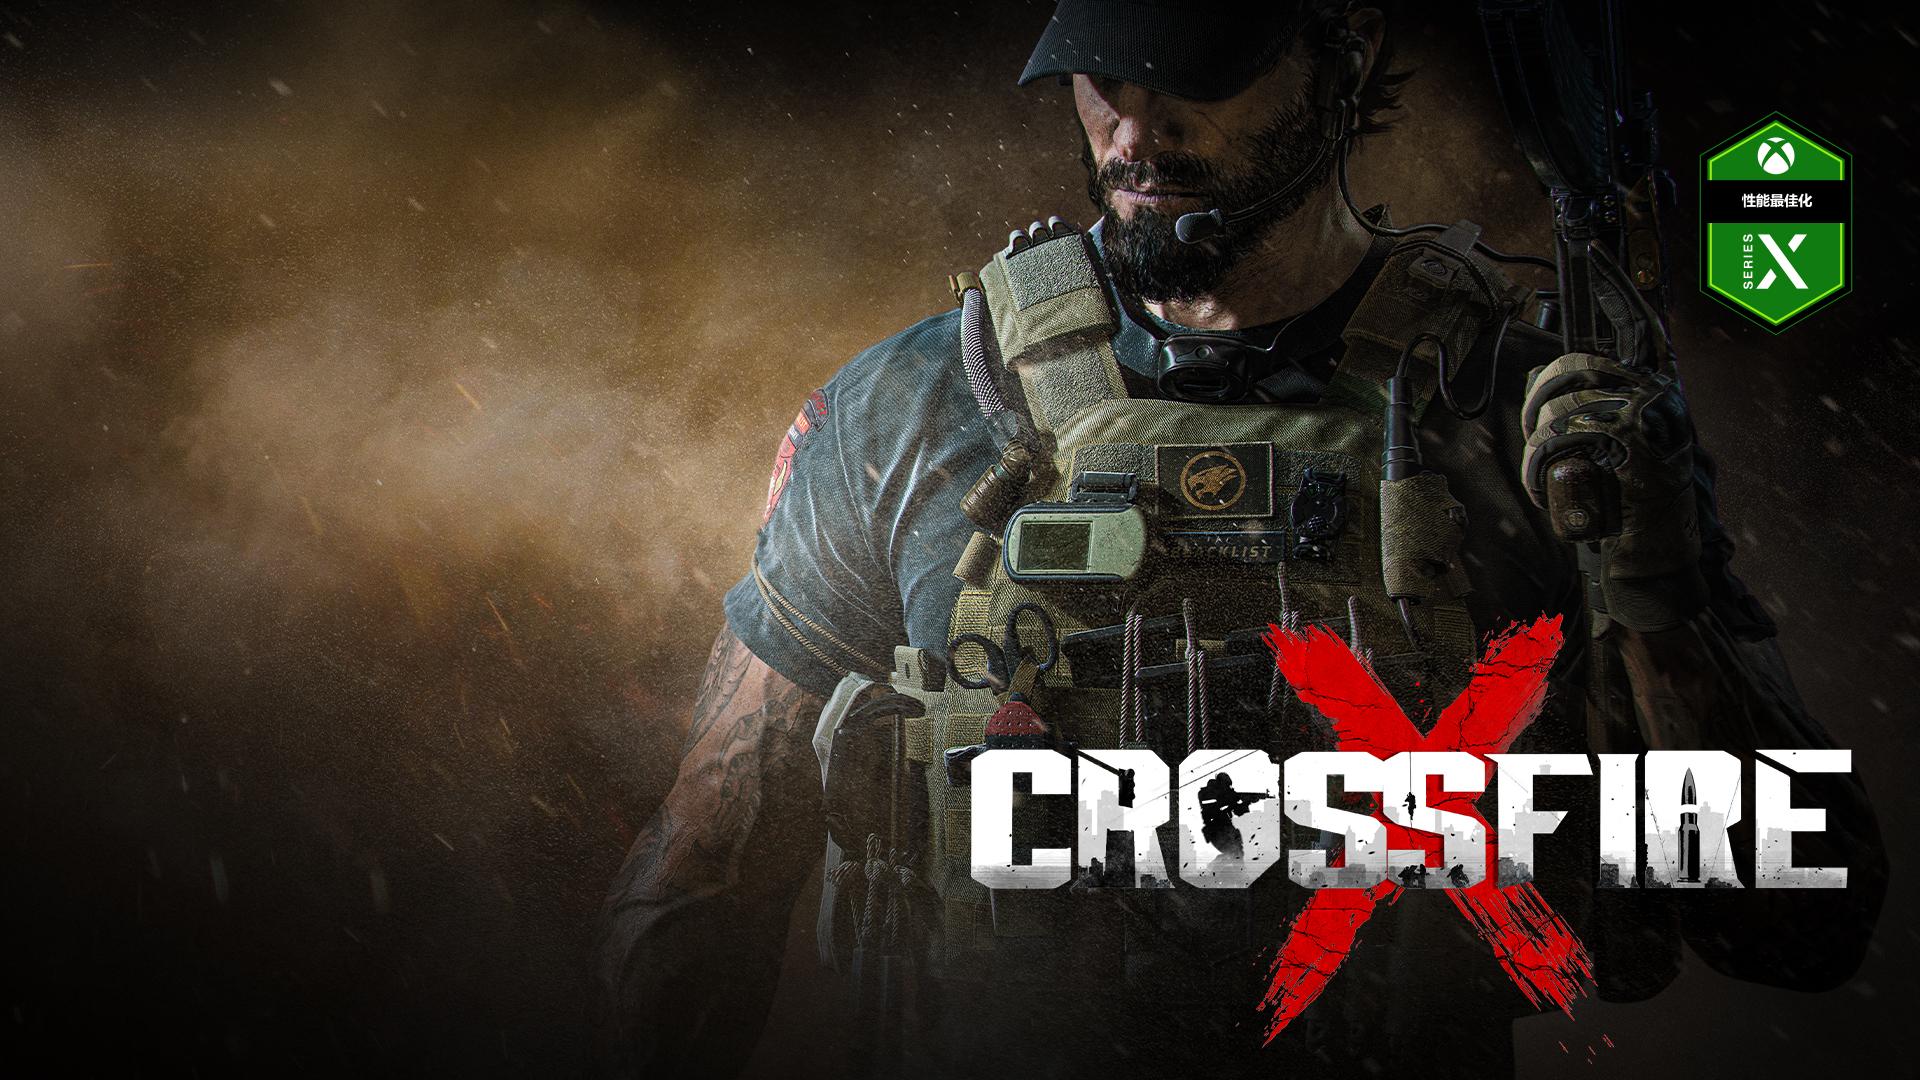 CrossfireX,Xbox Series X 性能最佳化,全副武裝的男人站在煙霧和灰燼之中